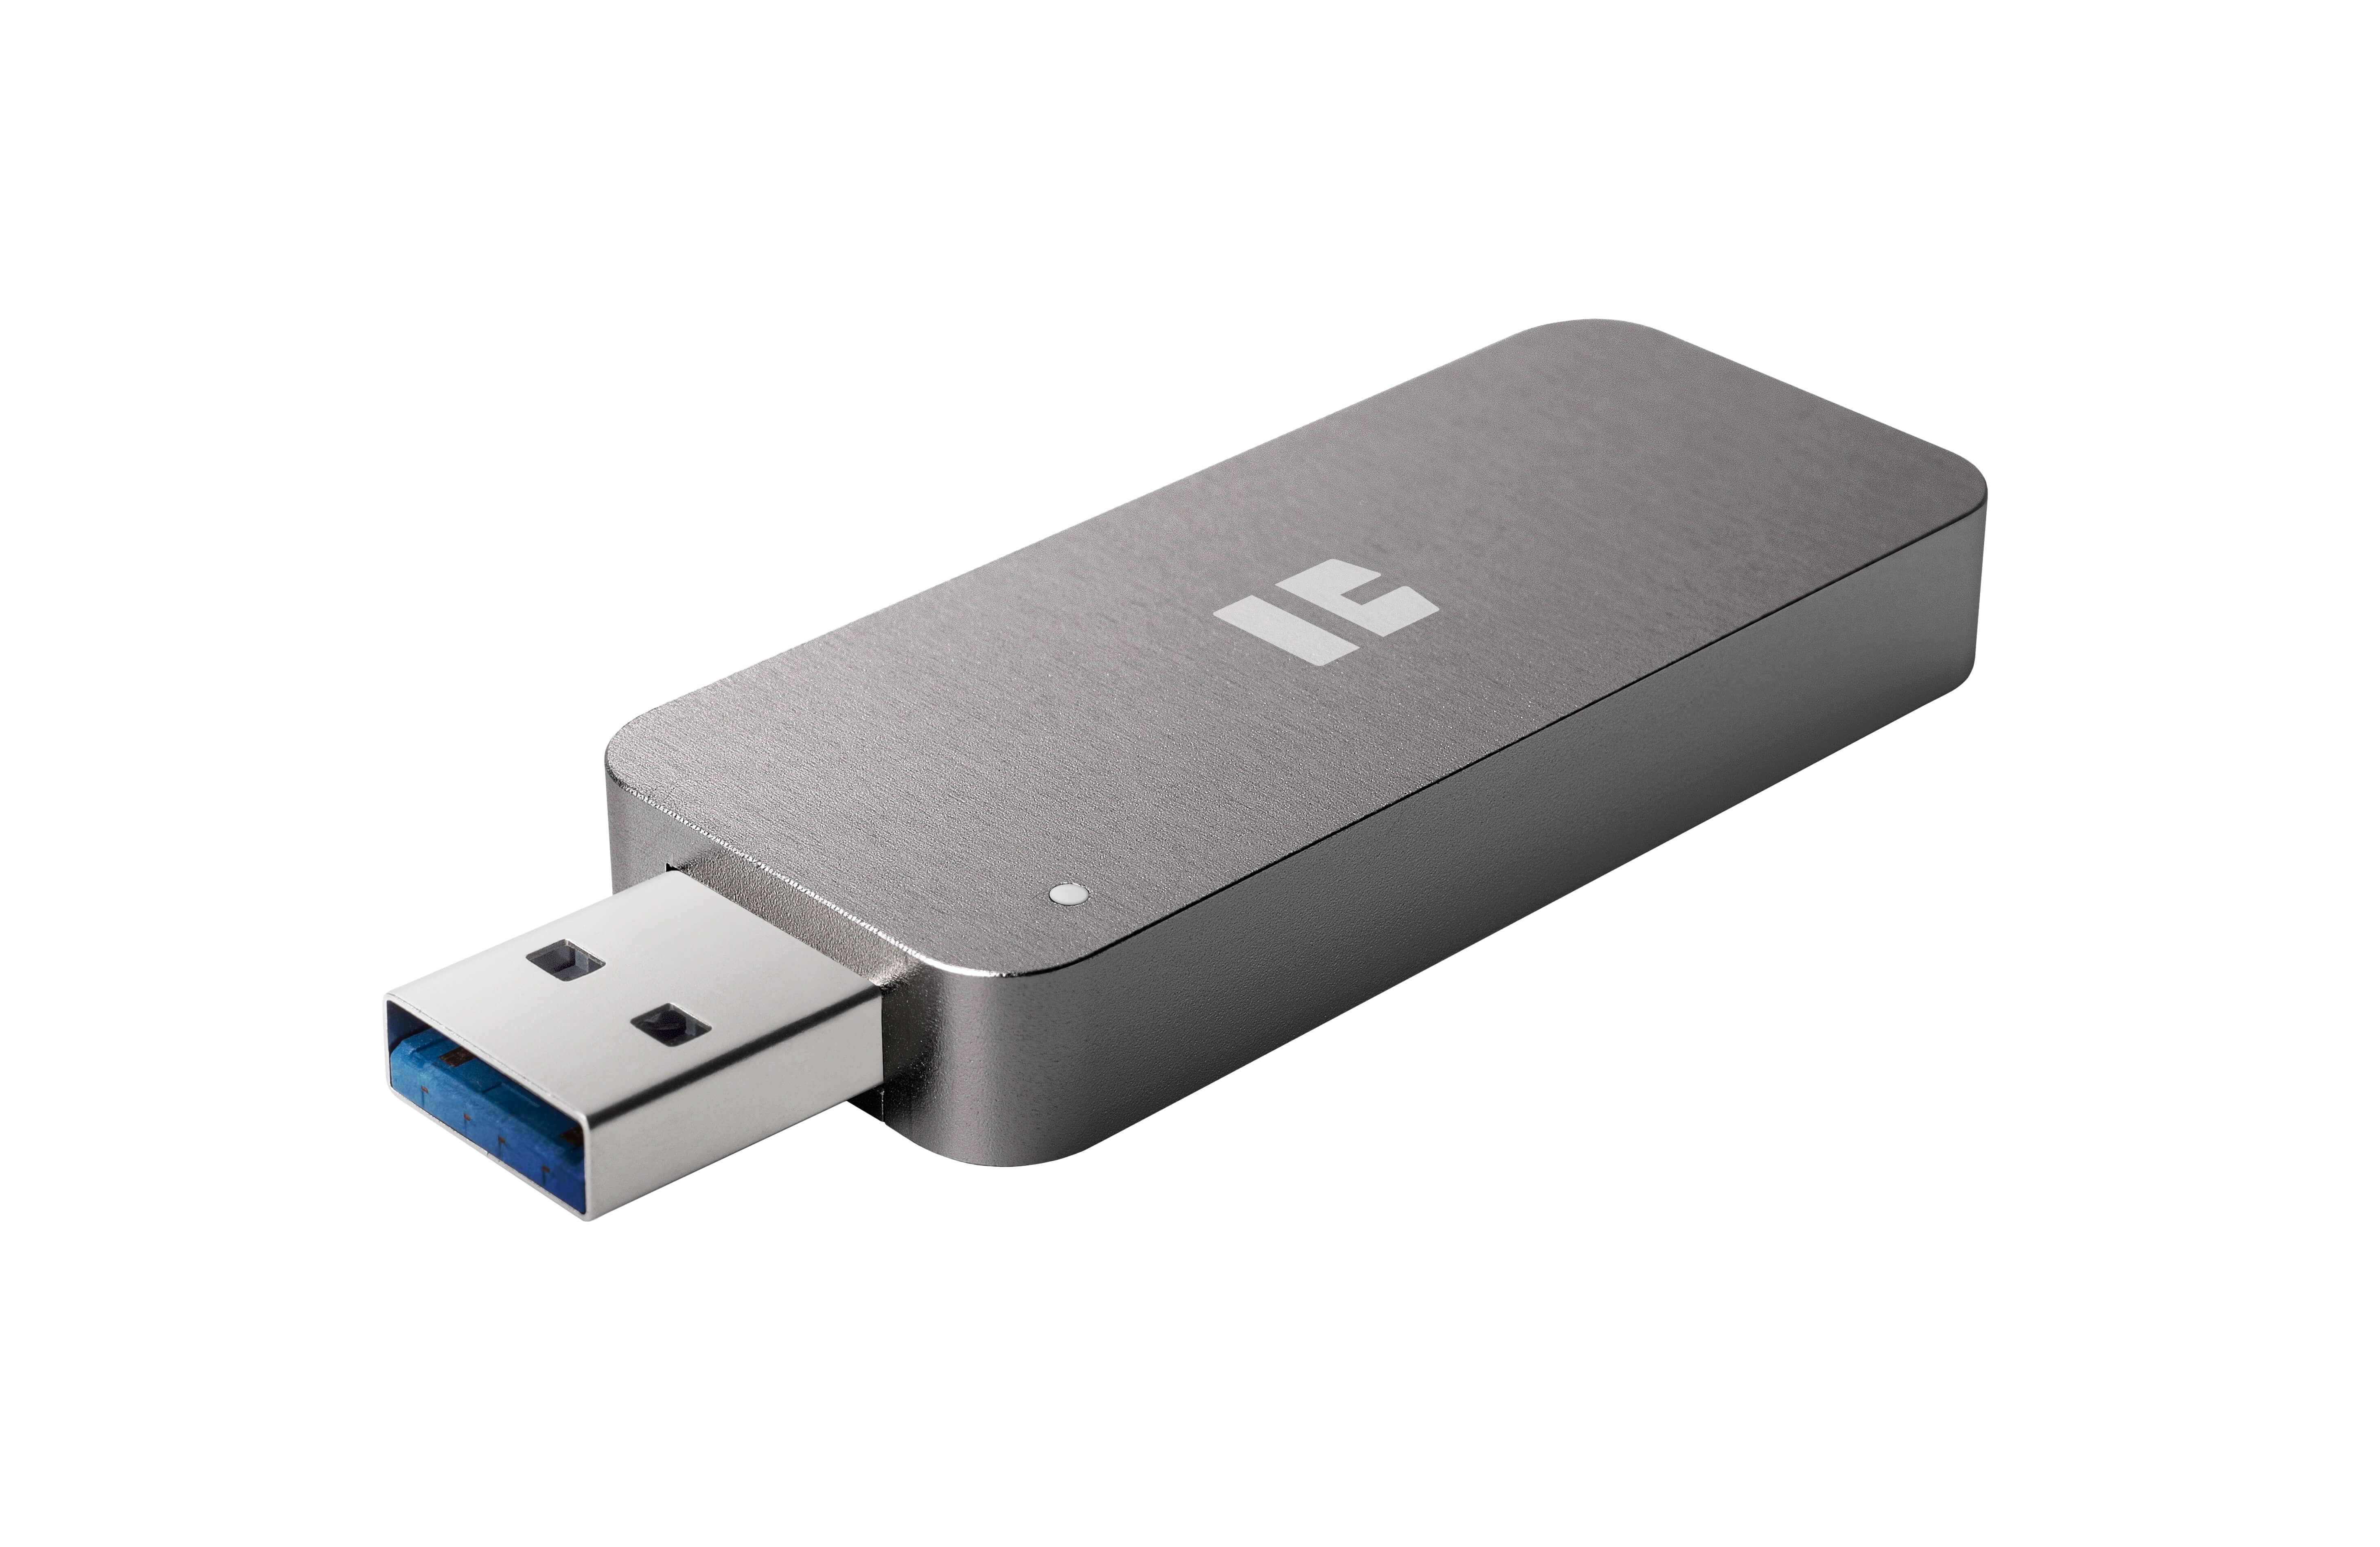 Trekstor i.Gear SSD-Stick Prime